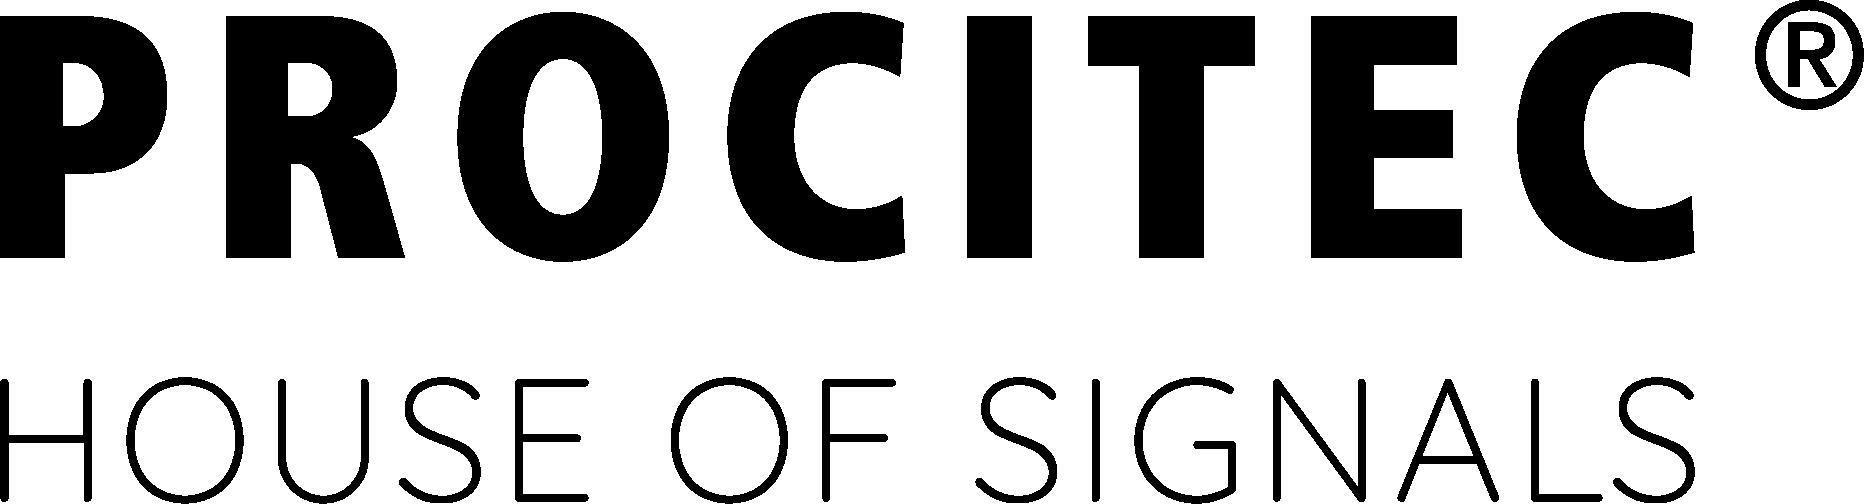 PROCITEC GmbH